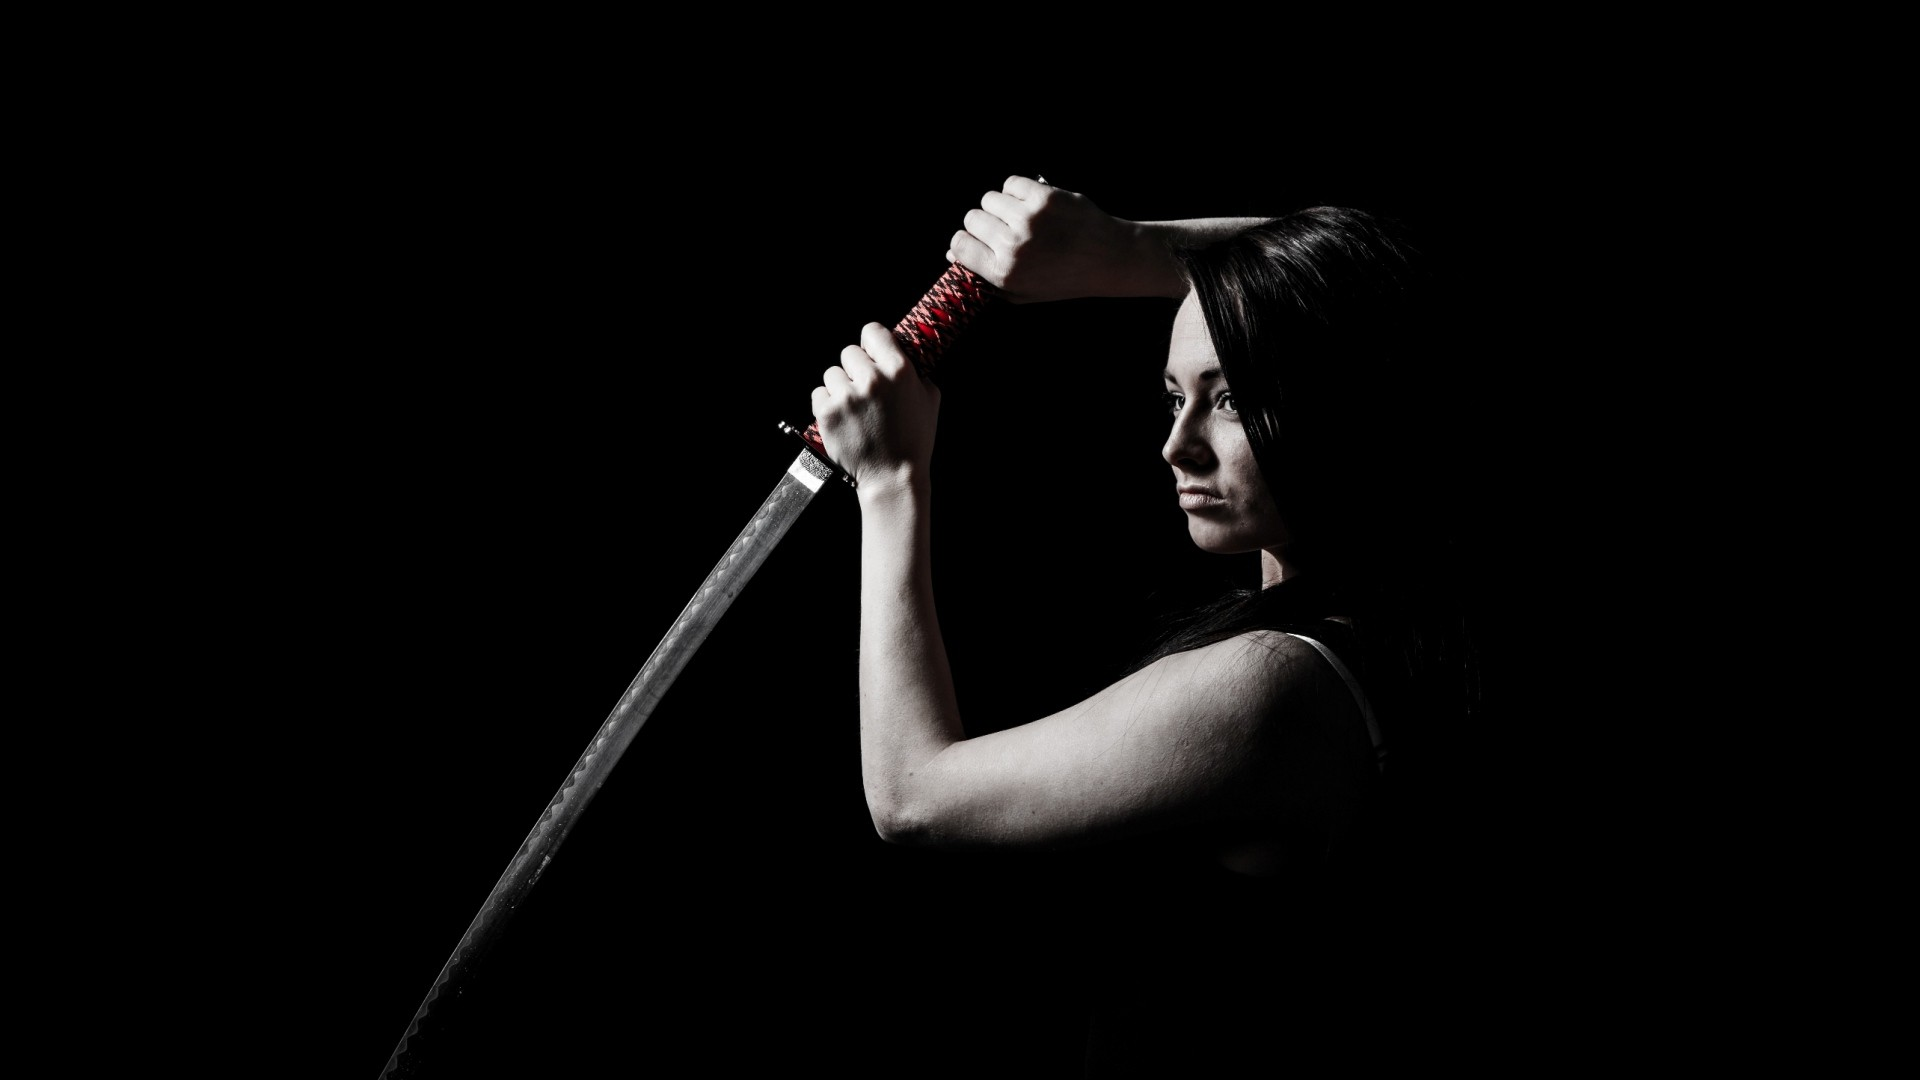 Samurai sword wallpaper 69 images - Girl with sword wallpaper ...